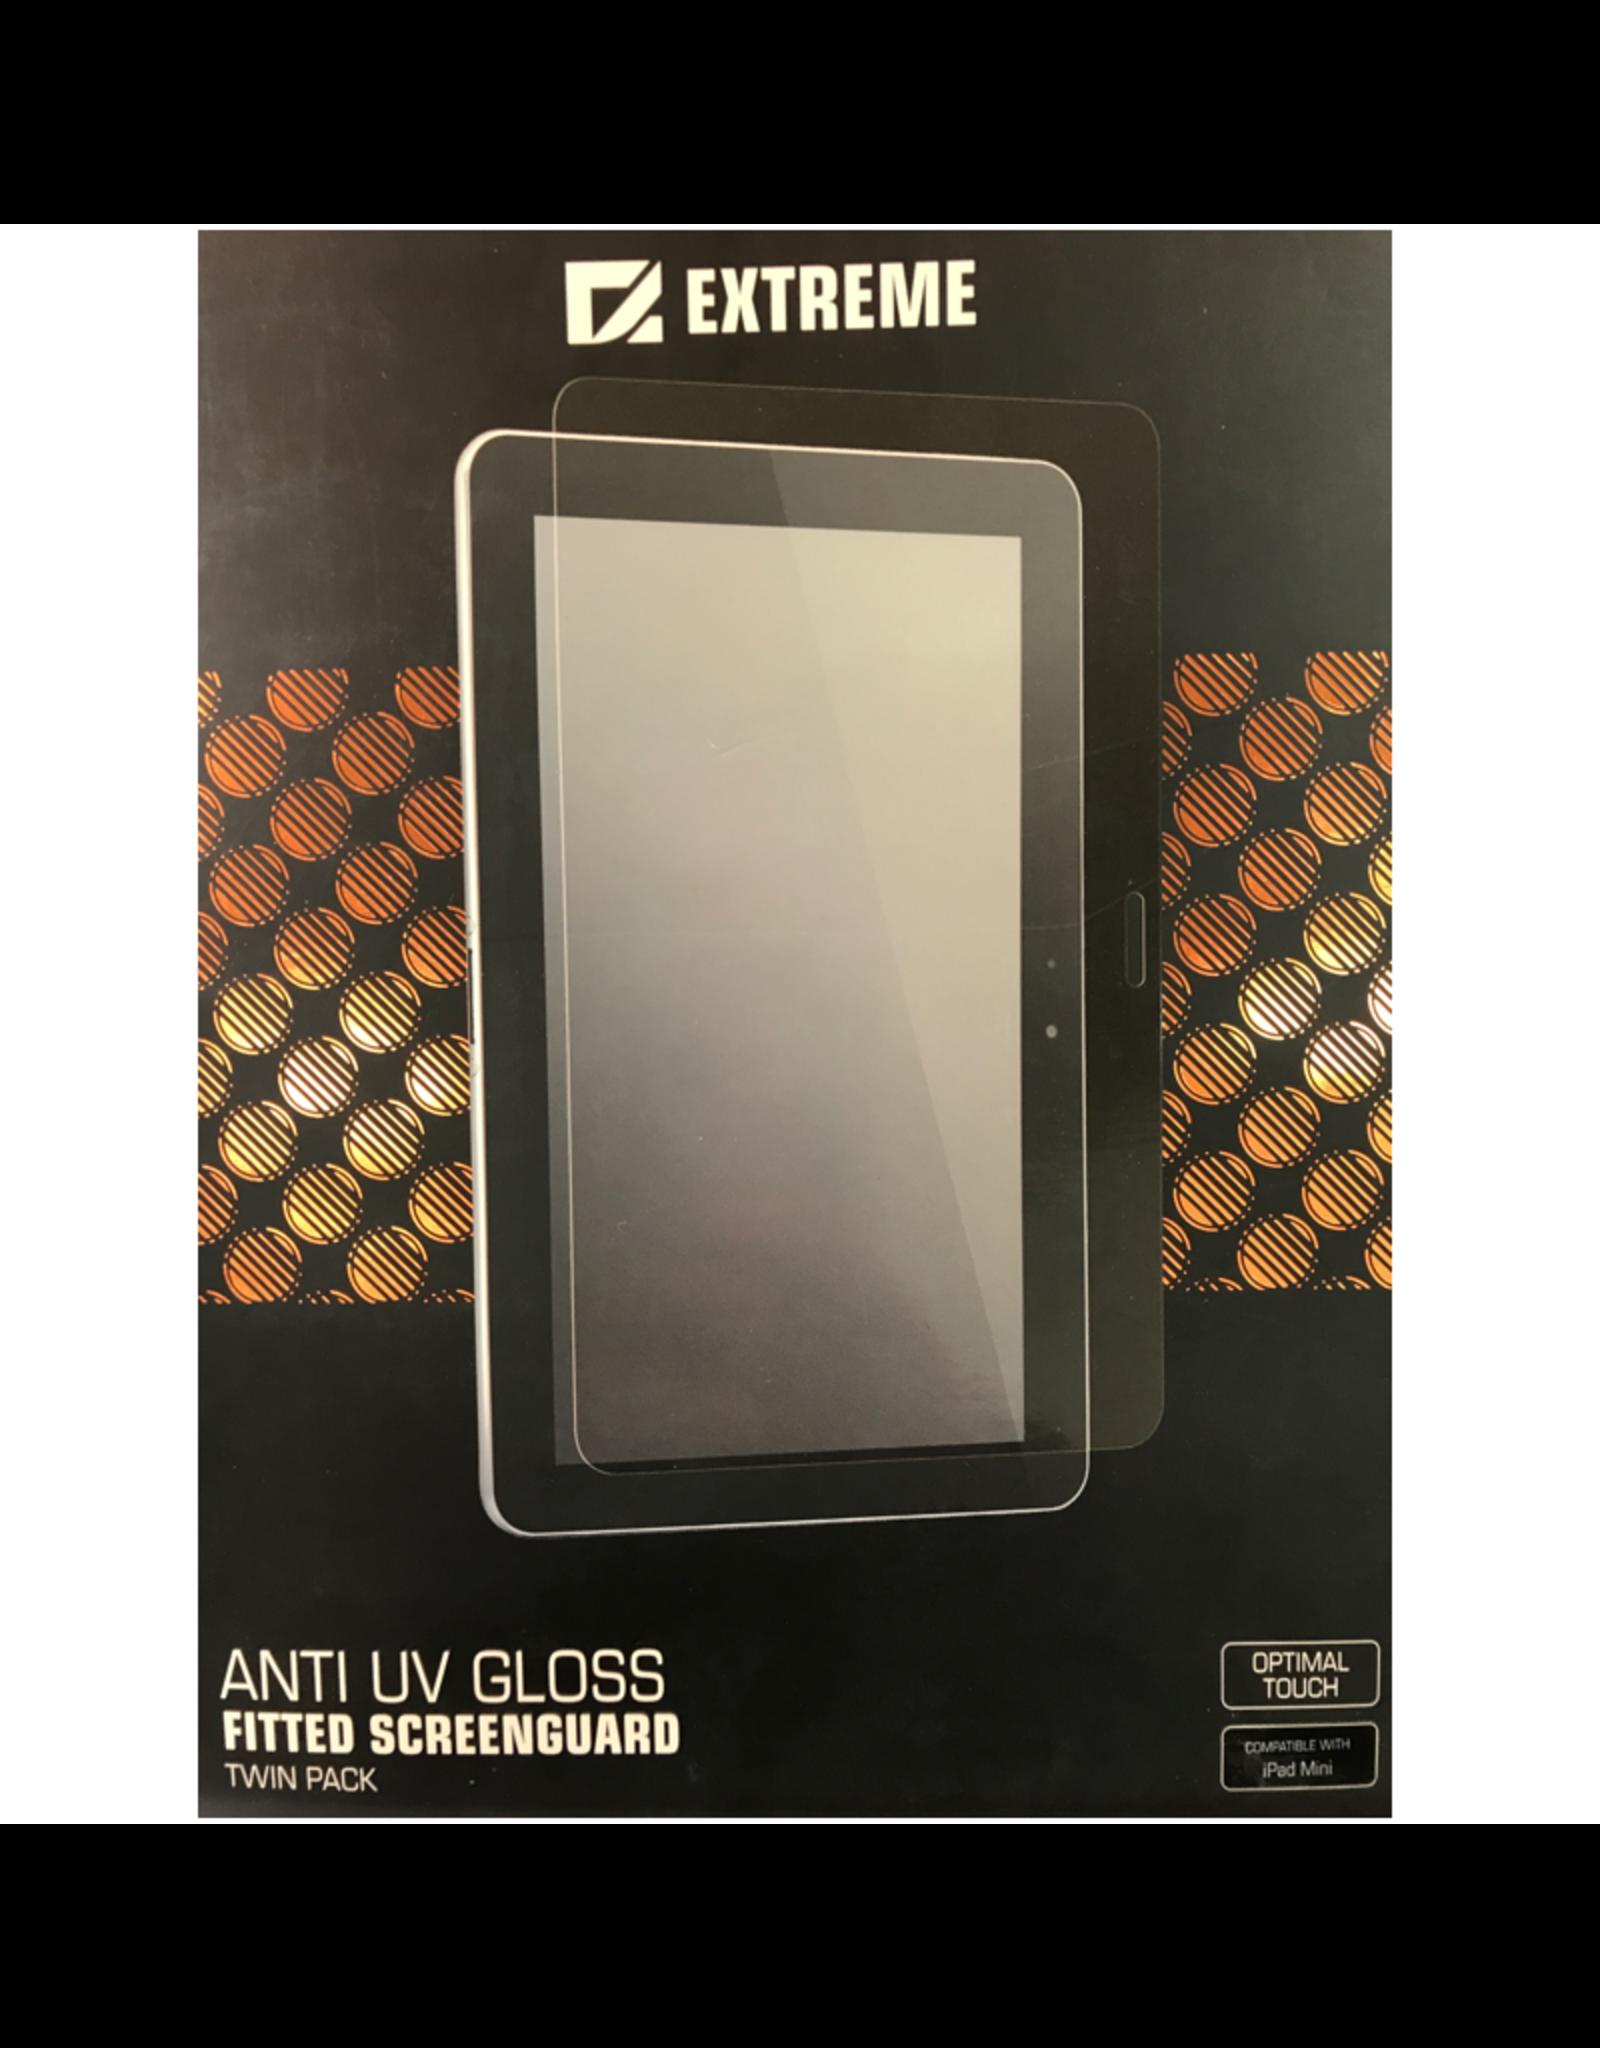 Extreme Extreme Anti UV Gloss ScreenGuard to suit iPad mini